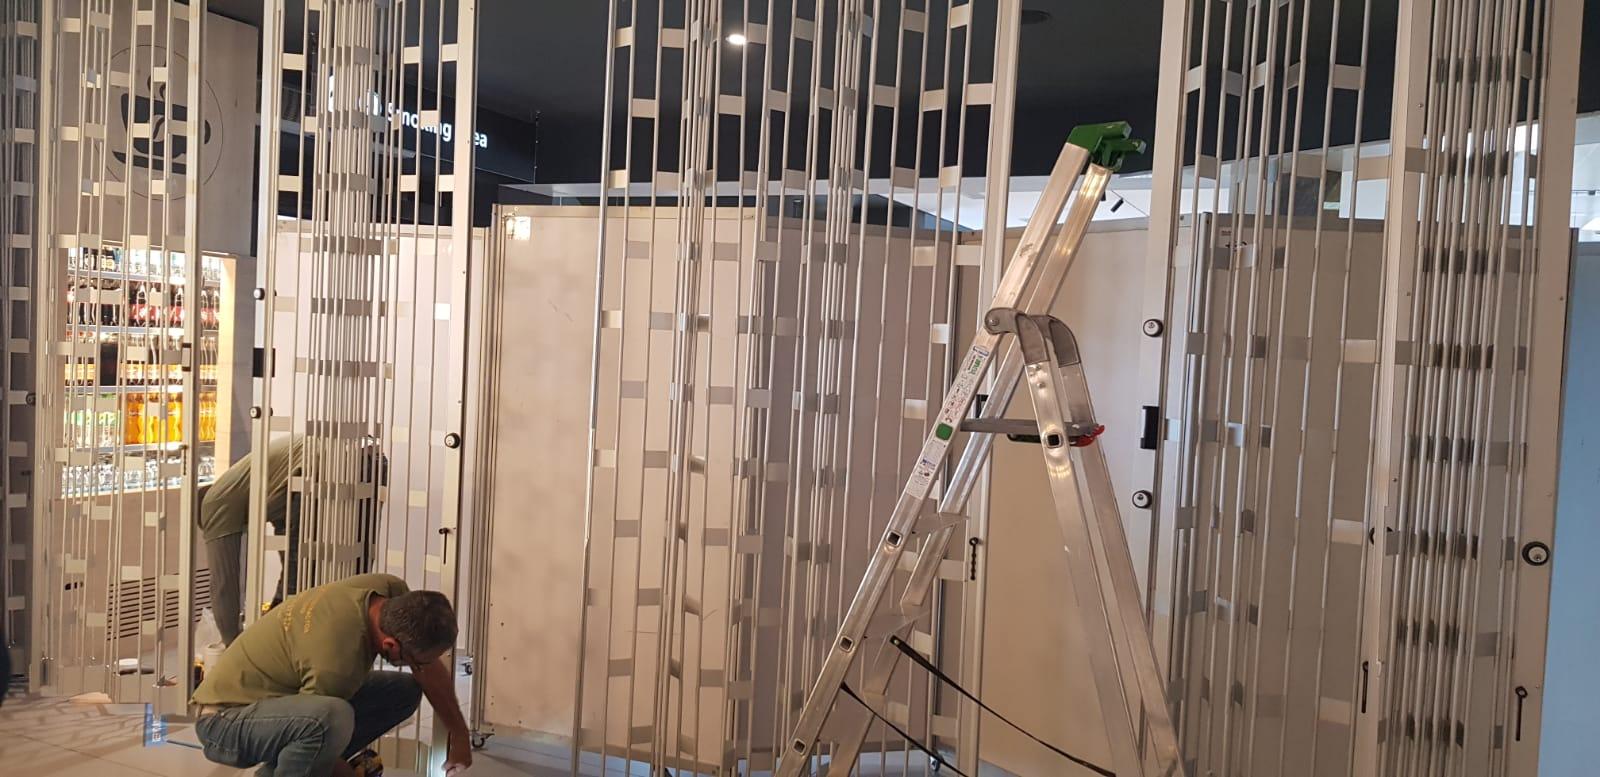 Foldable shutters